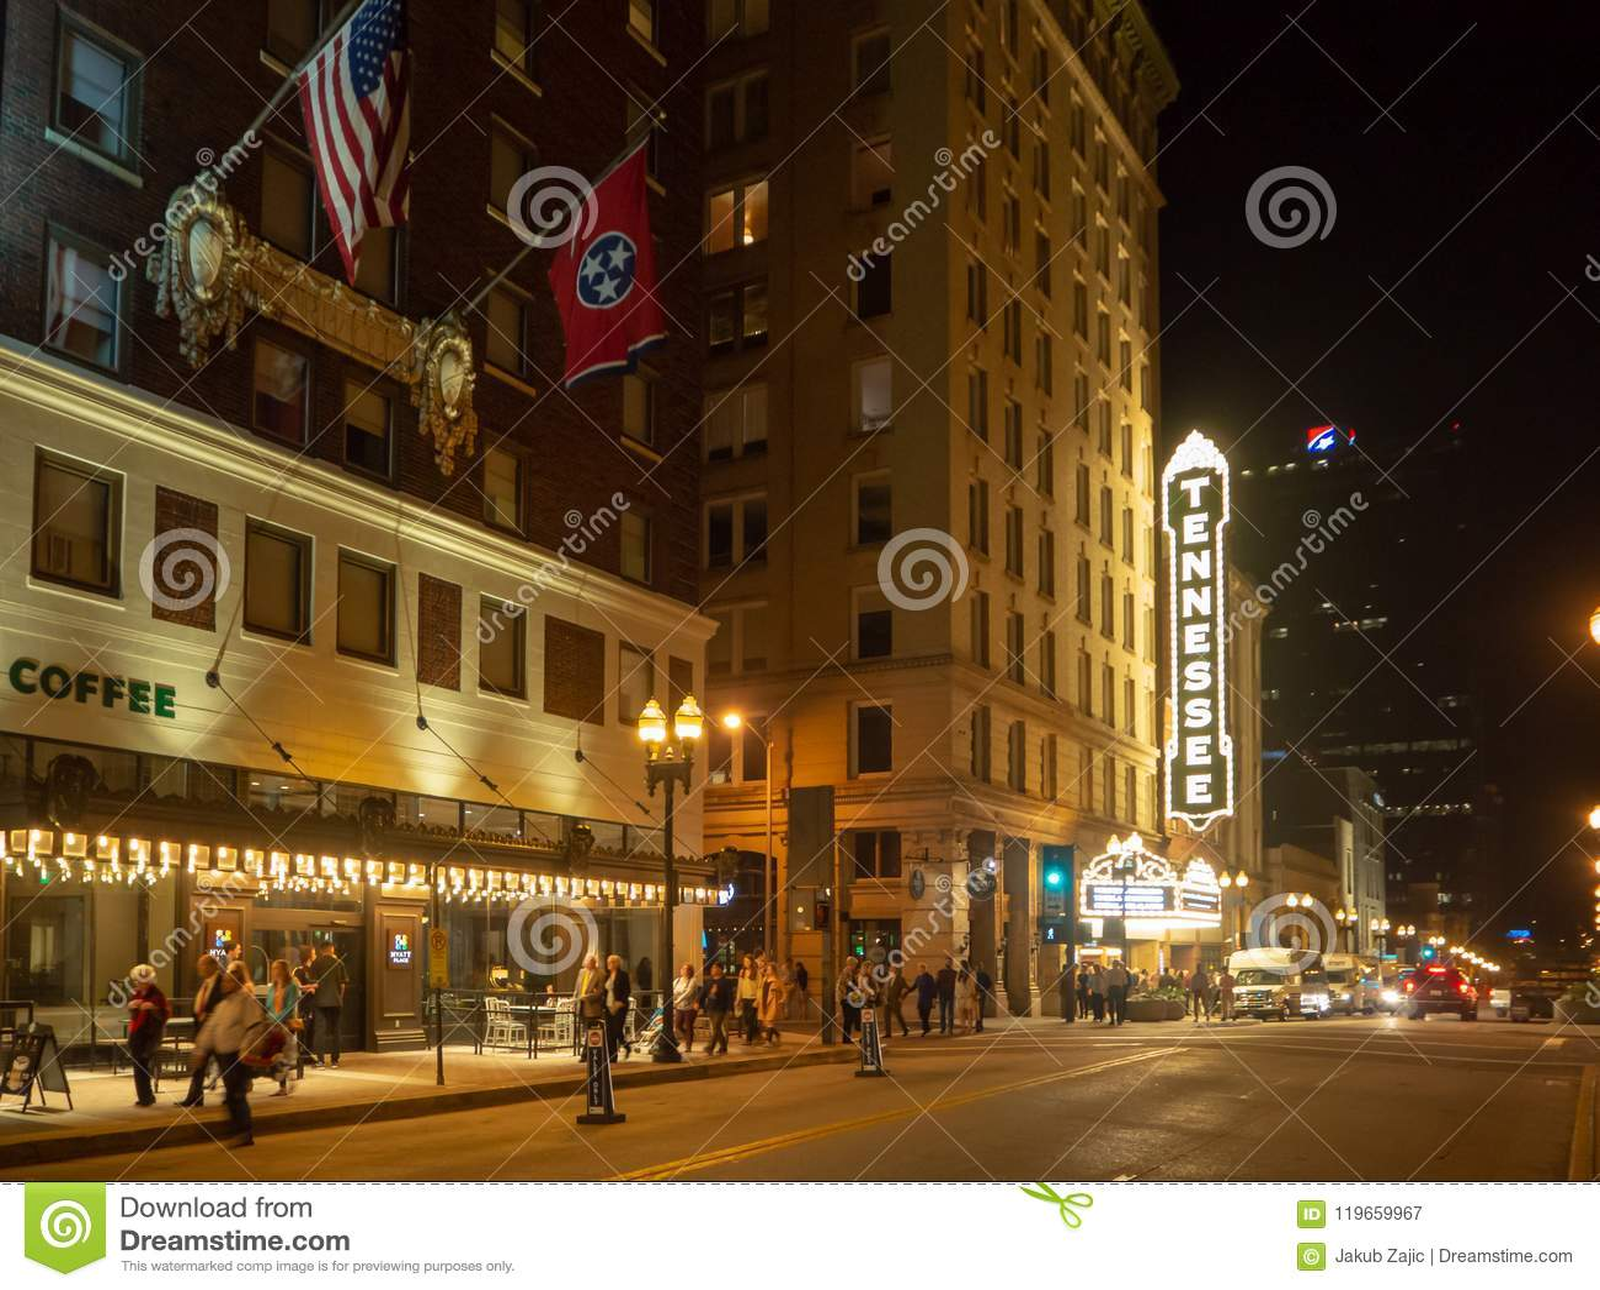 Homoseksualna ulica, Knoxville, Tennessee, Stany Zjednoczone Ameryka: [nocy życie w centrum Knoxville]